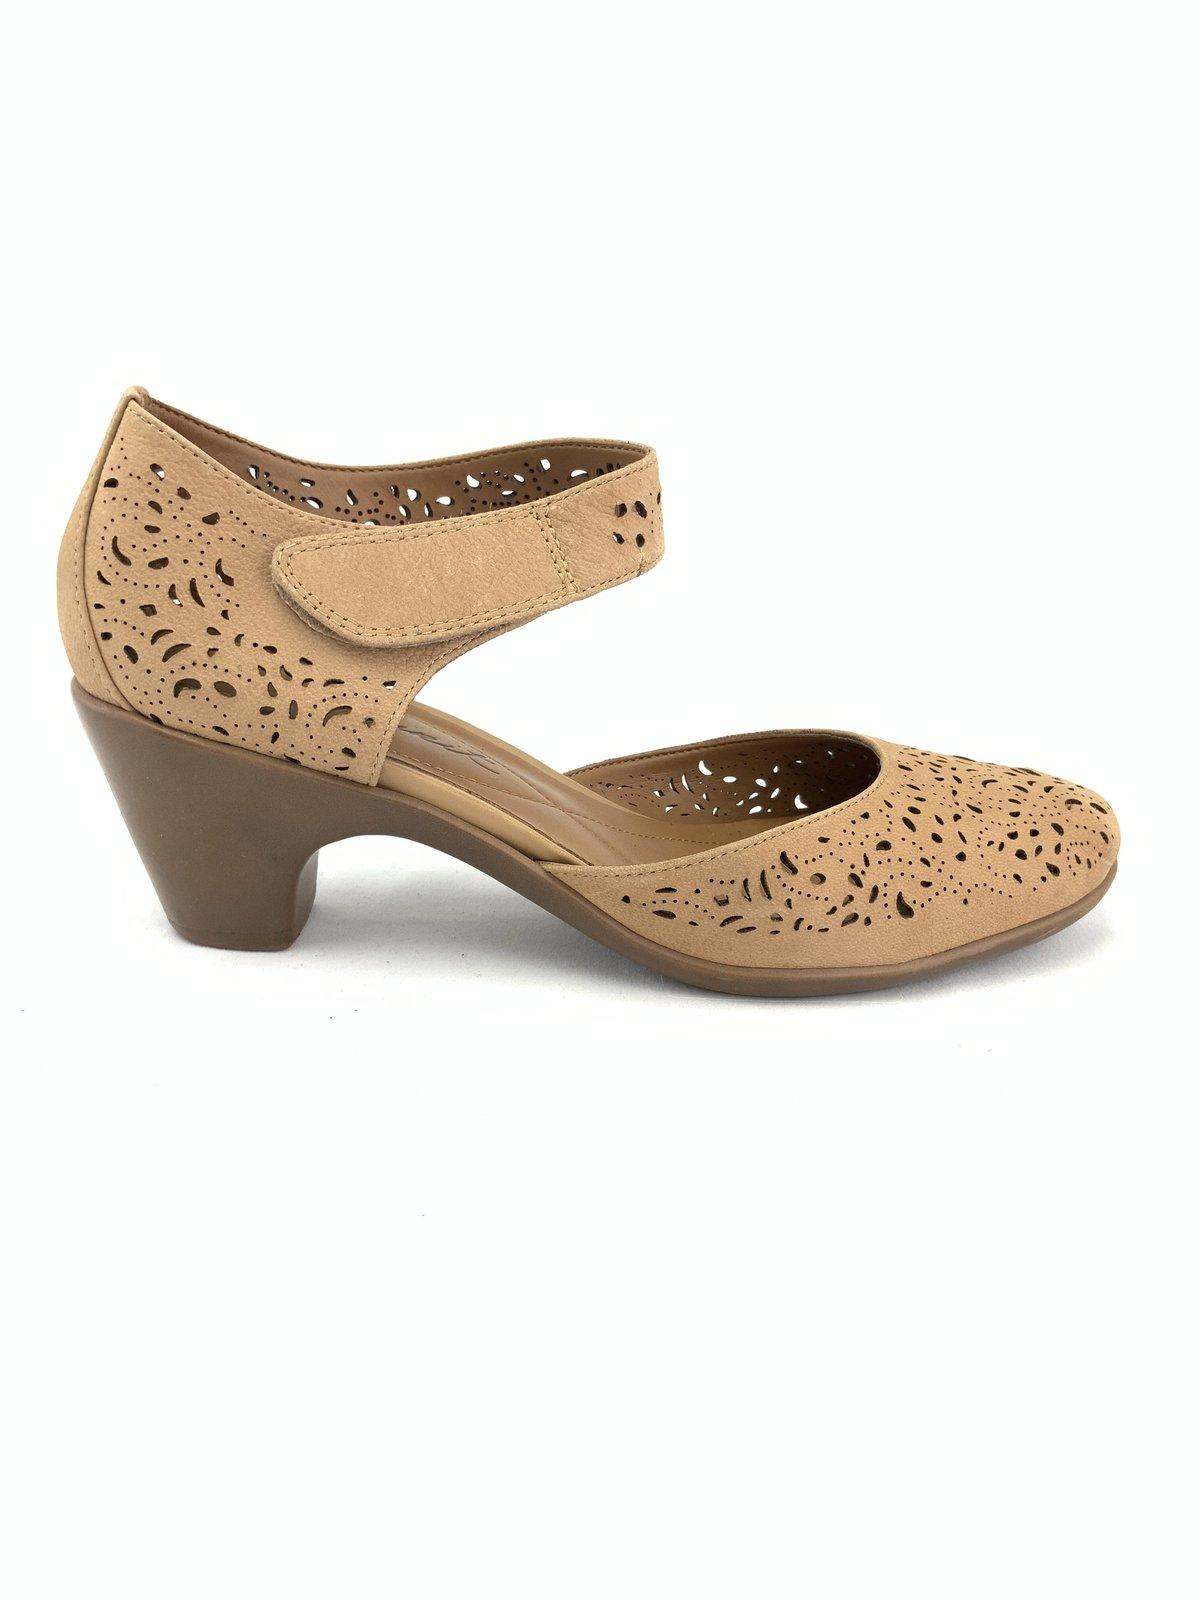 Easy Spirit Cindie Cut Out Heels Size 6.5M - $40.70 CAD